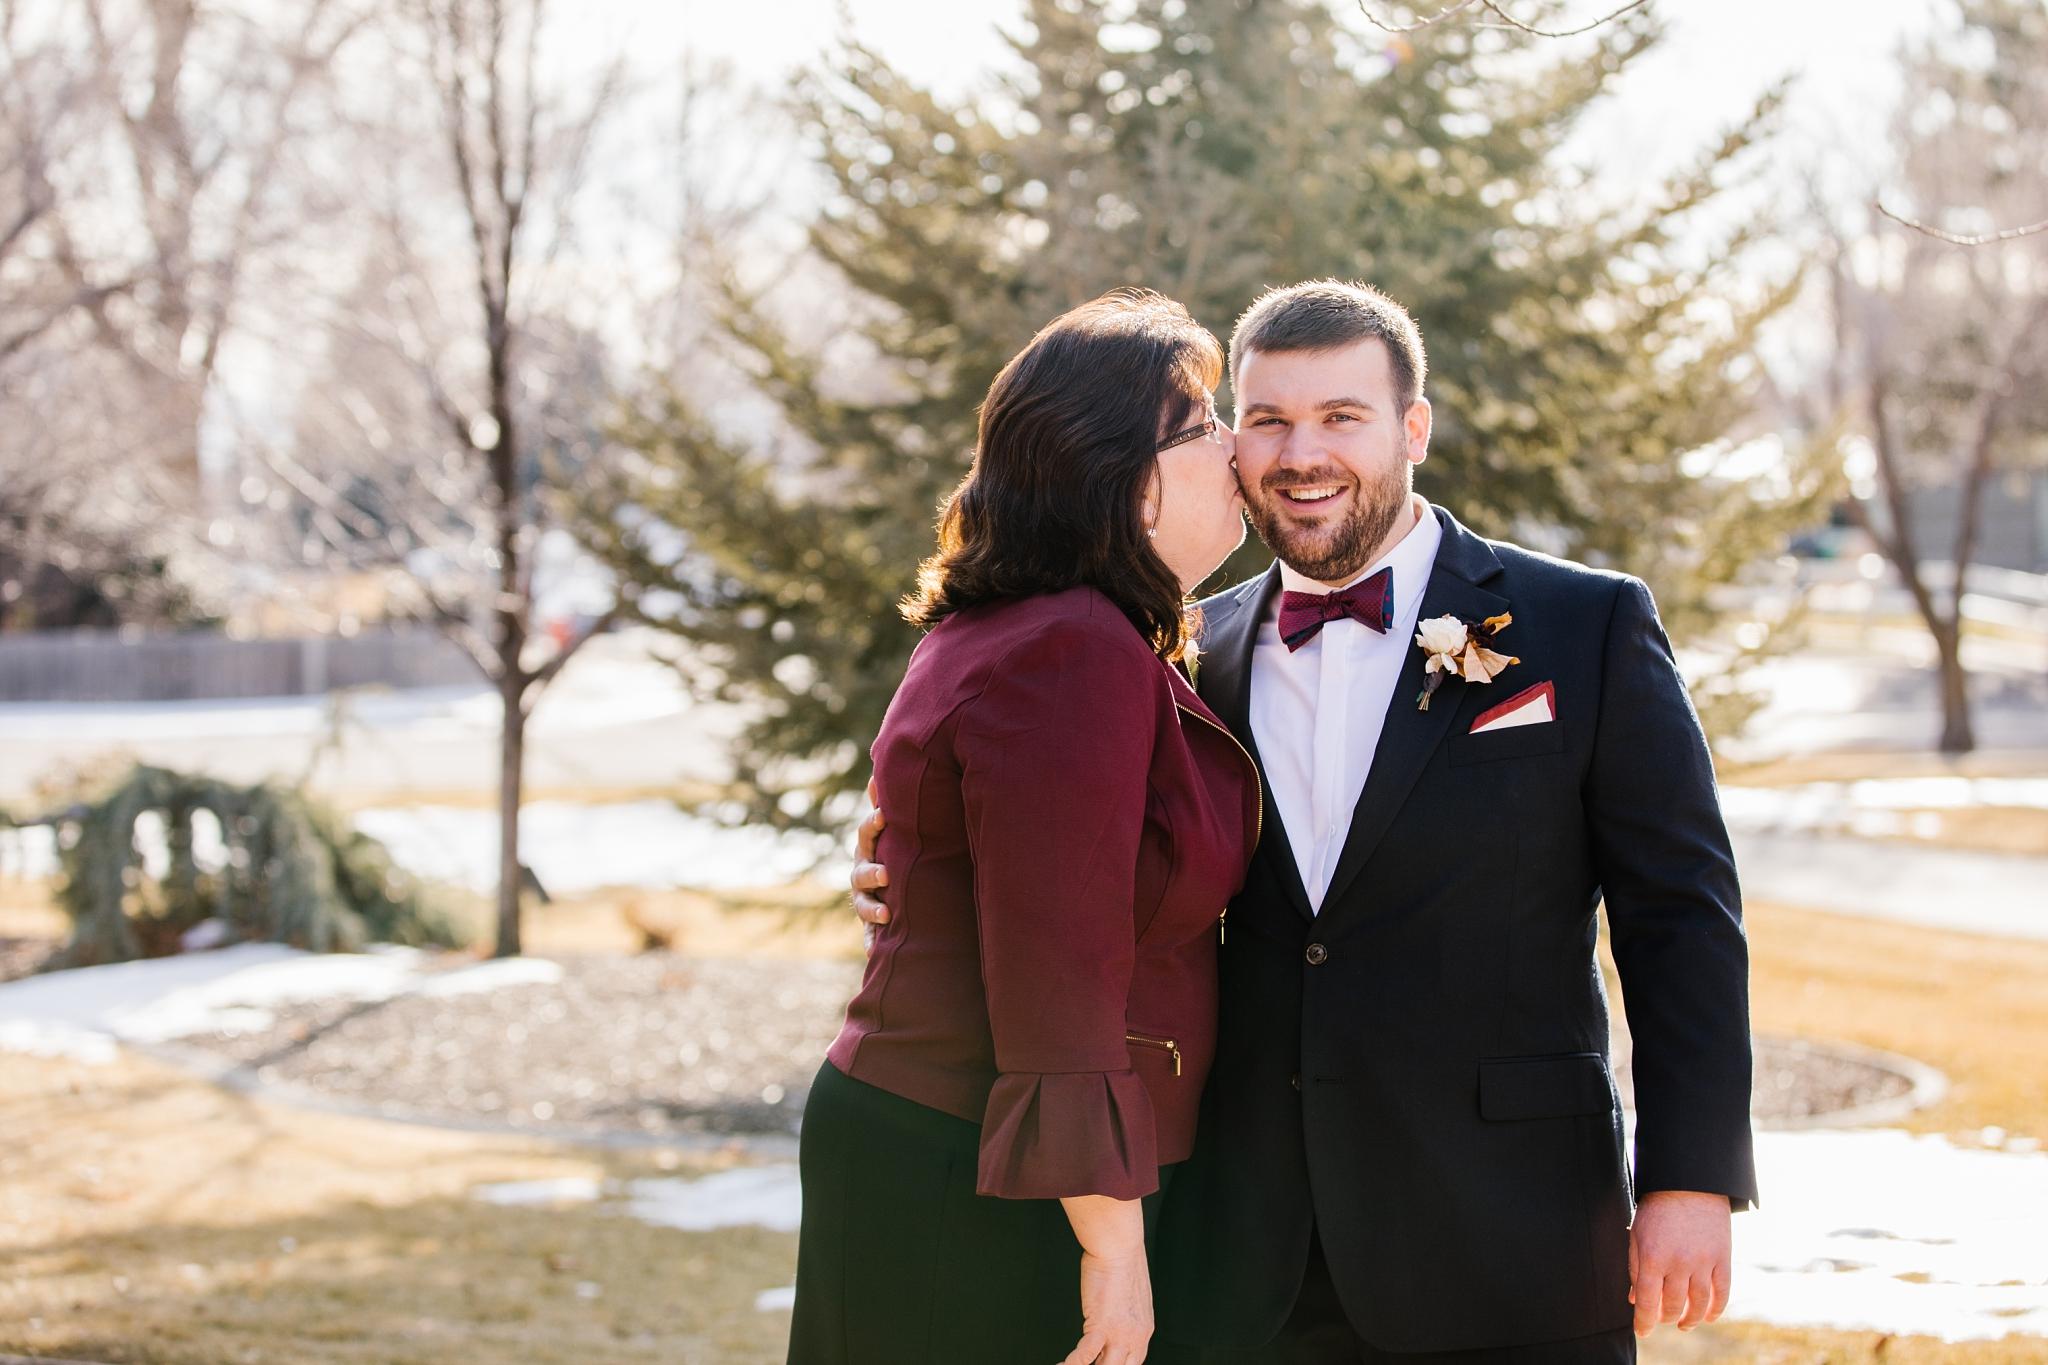 CN-Wedding-95_Lizzie-B-Imagery-Utah-Wedding-Photographer-Blessed-Sacrament-Catholic-Church-Sandy-Utah-The-Blended-Table-Salt-Lake-City.jpg